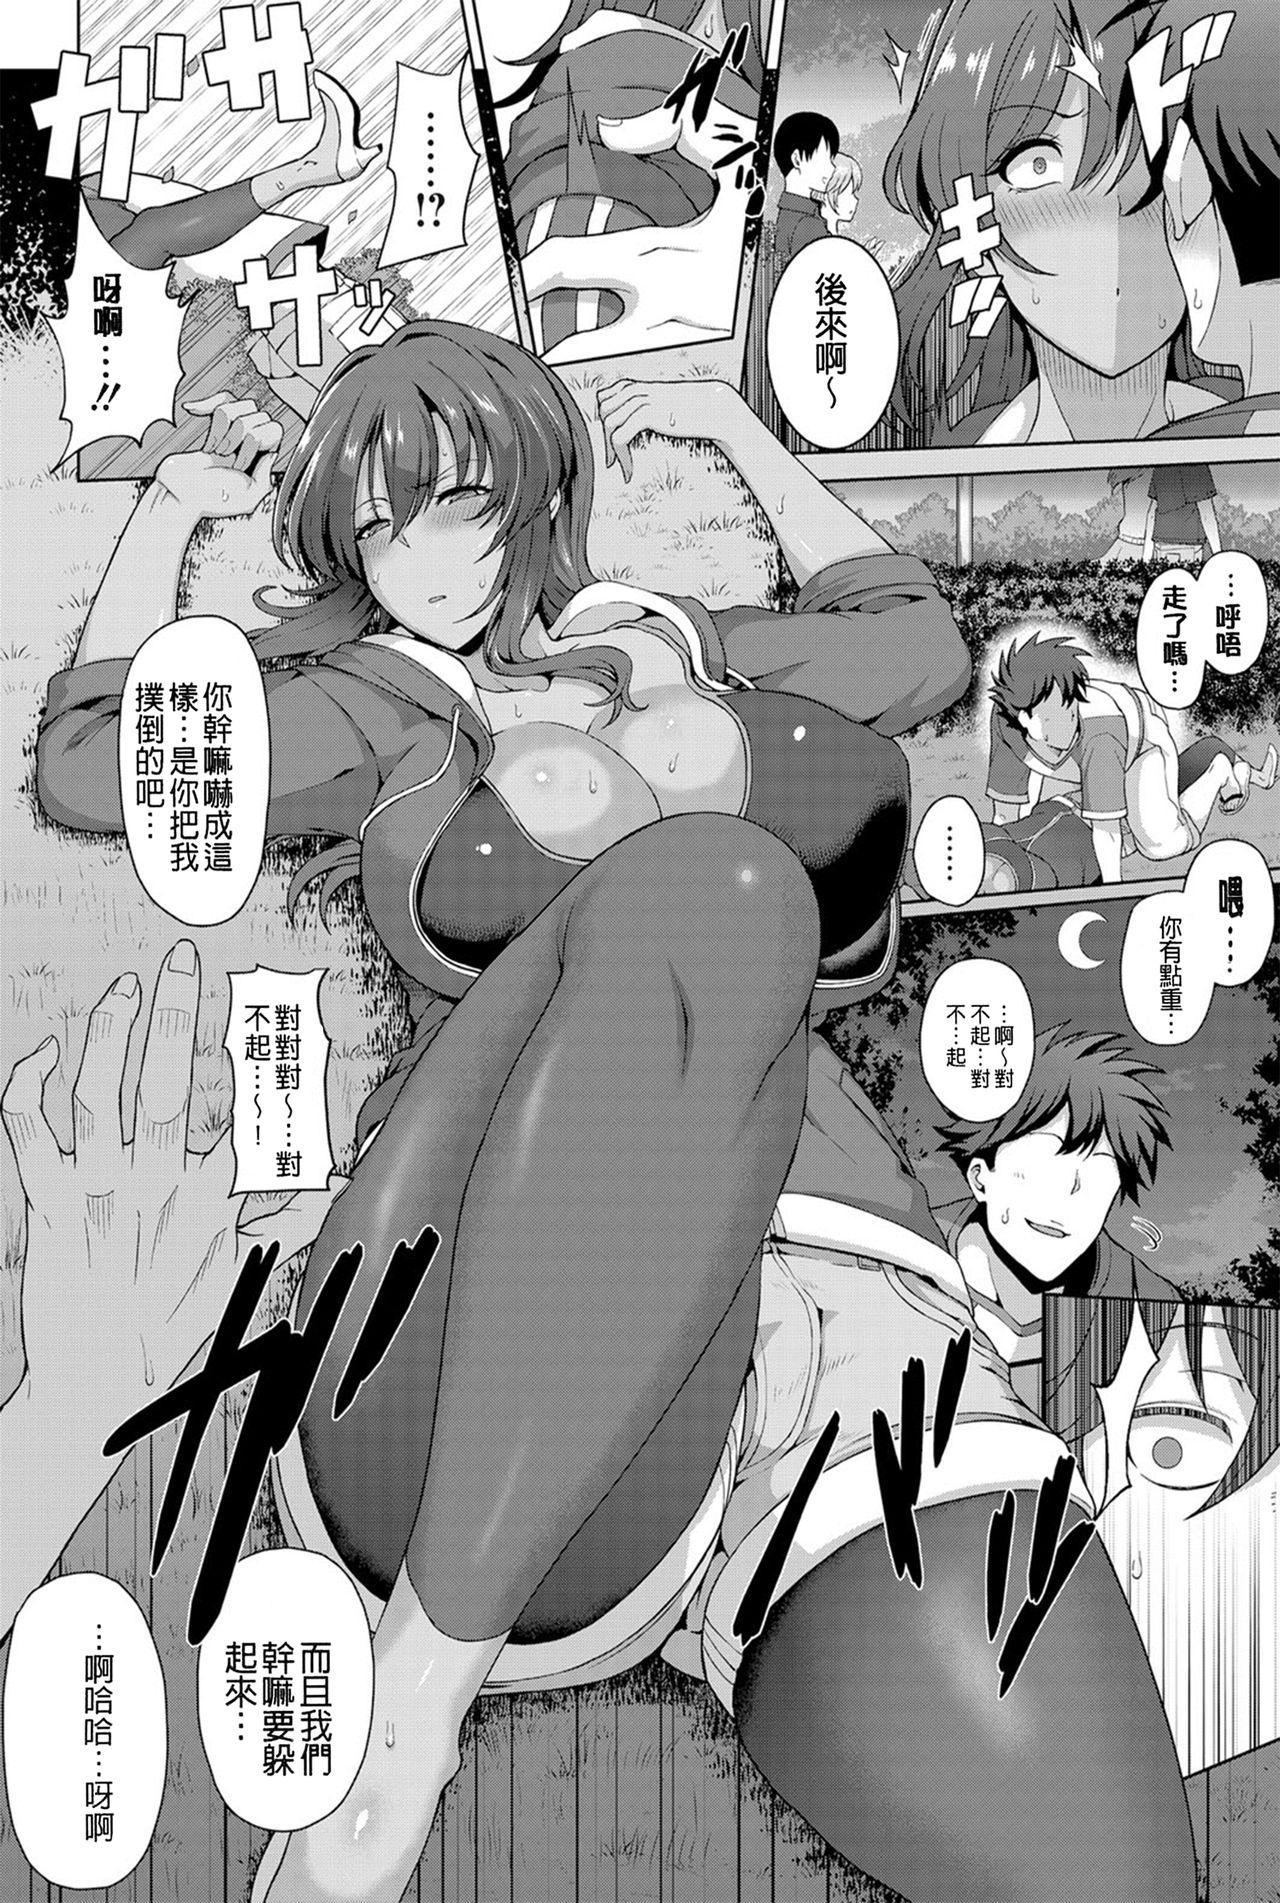 Juku Mesu - Erotic Mature Women 38